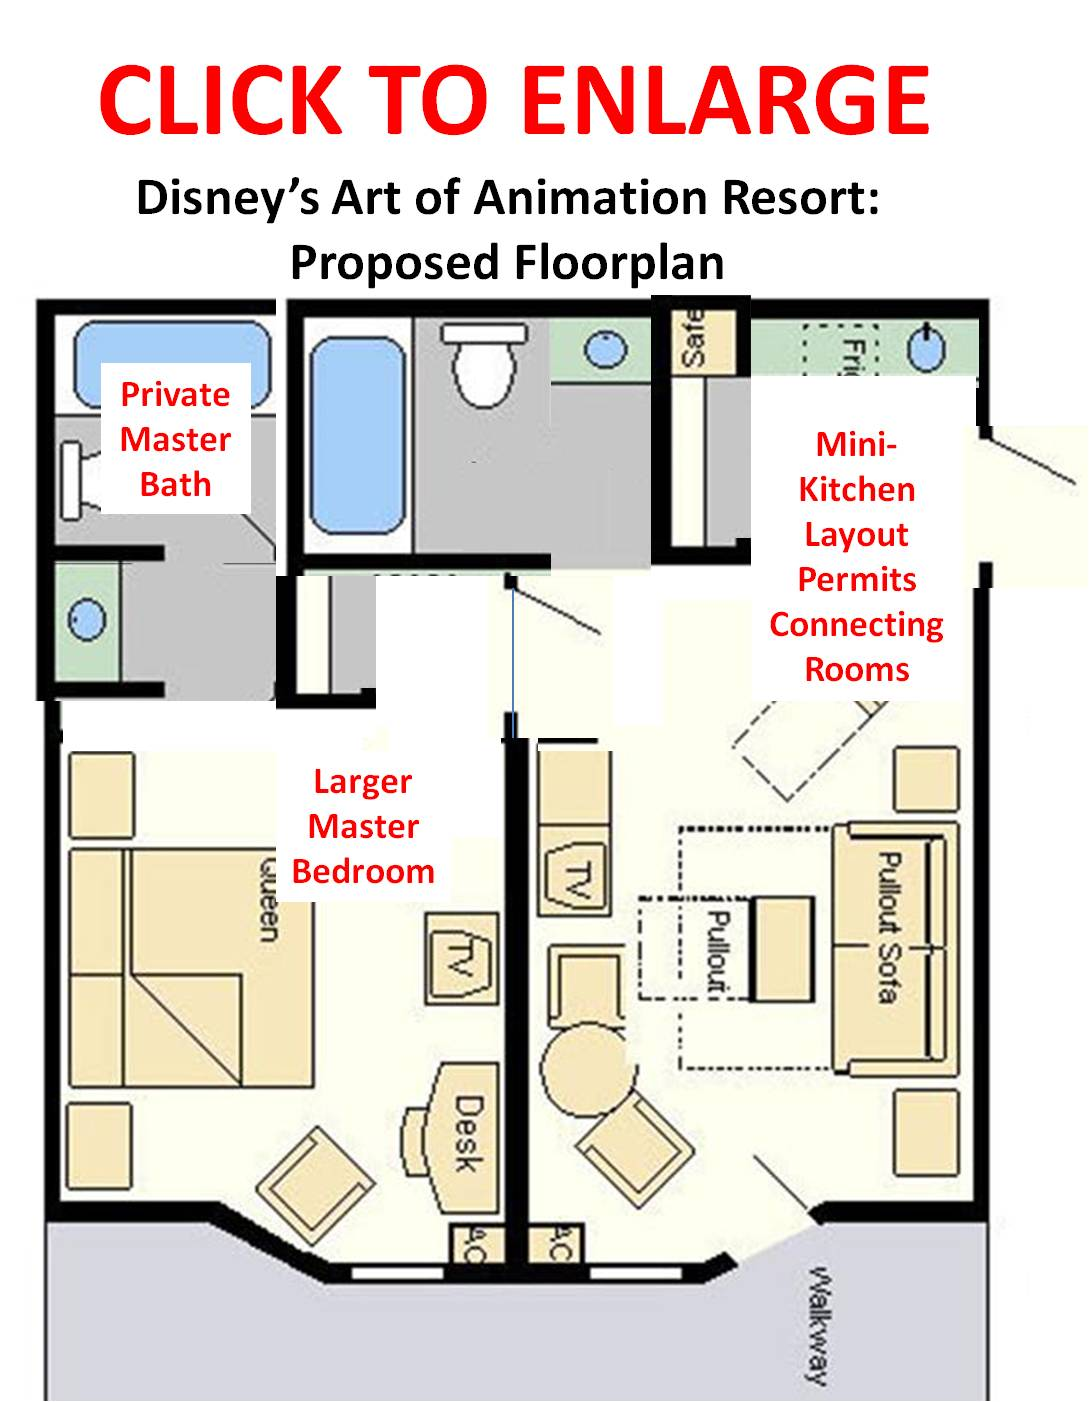 Tangled In Disney Disney S New Resort Art Of Animation Opens Today